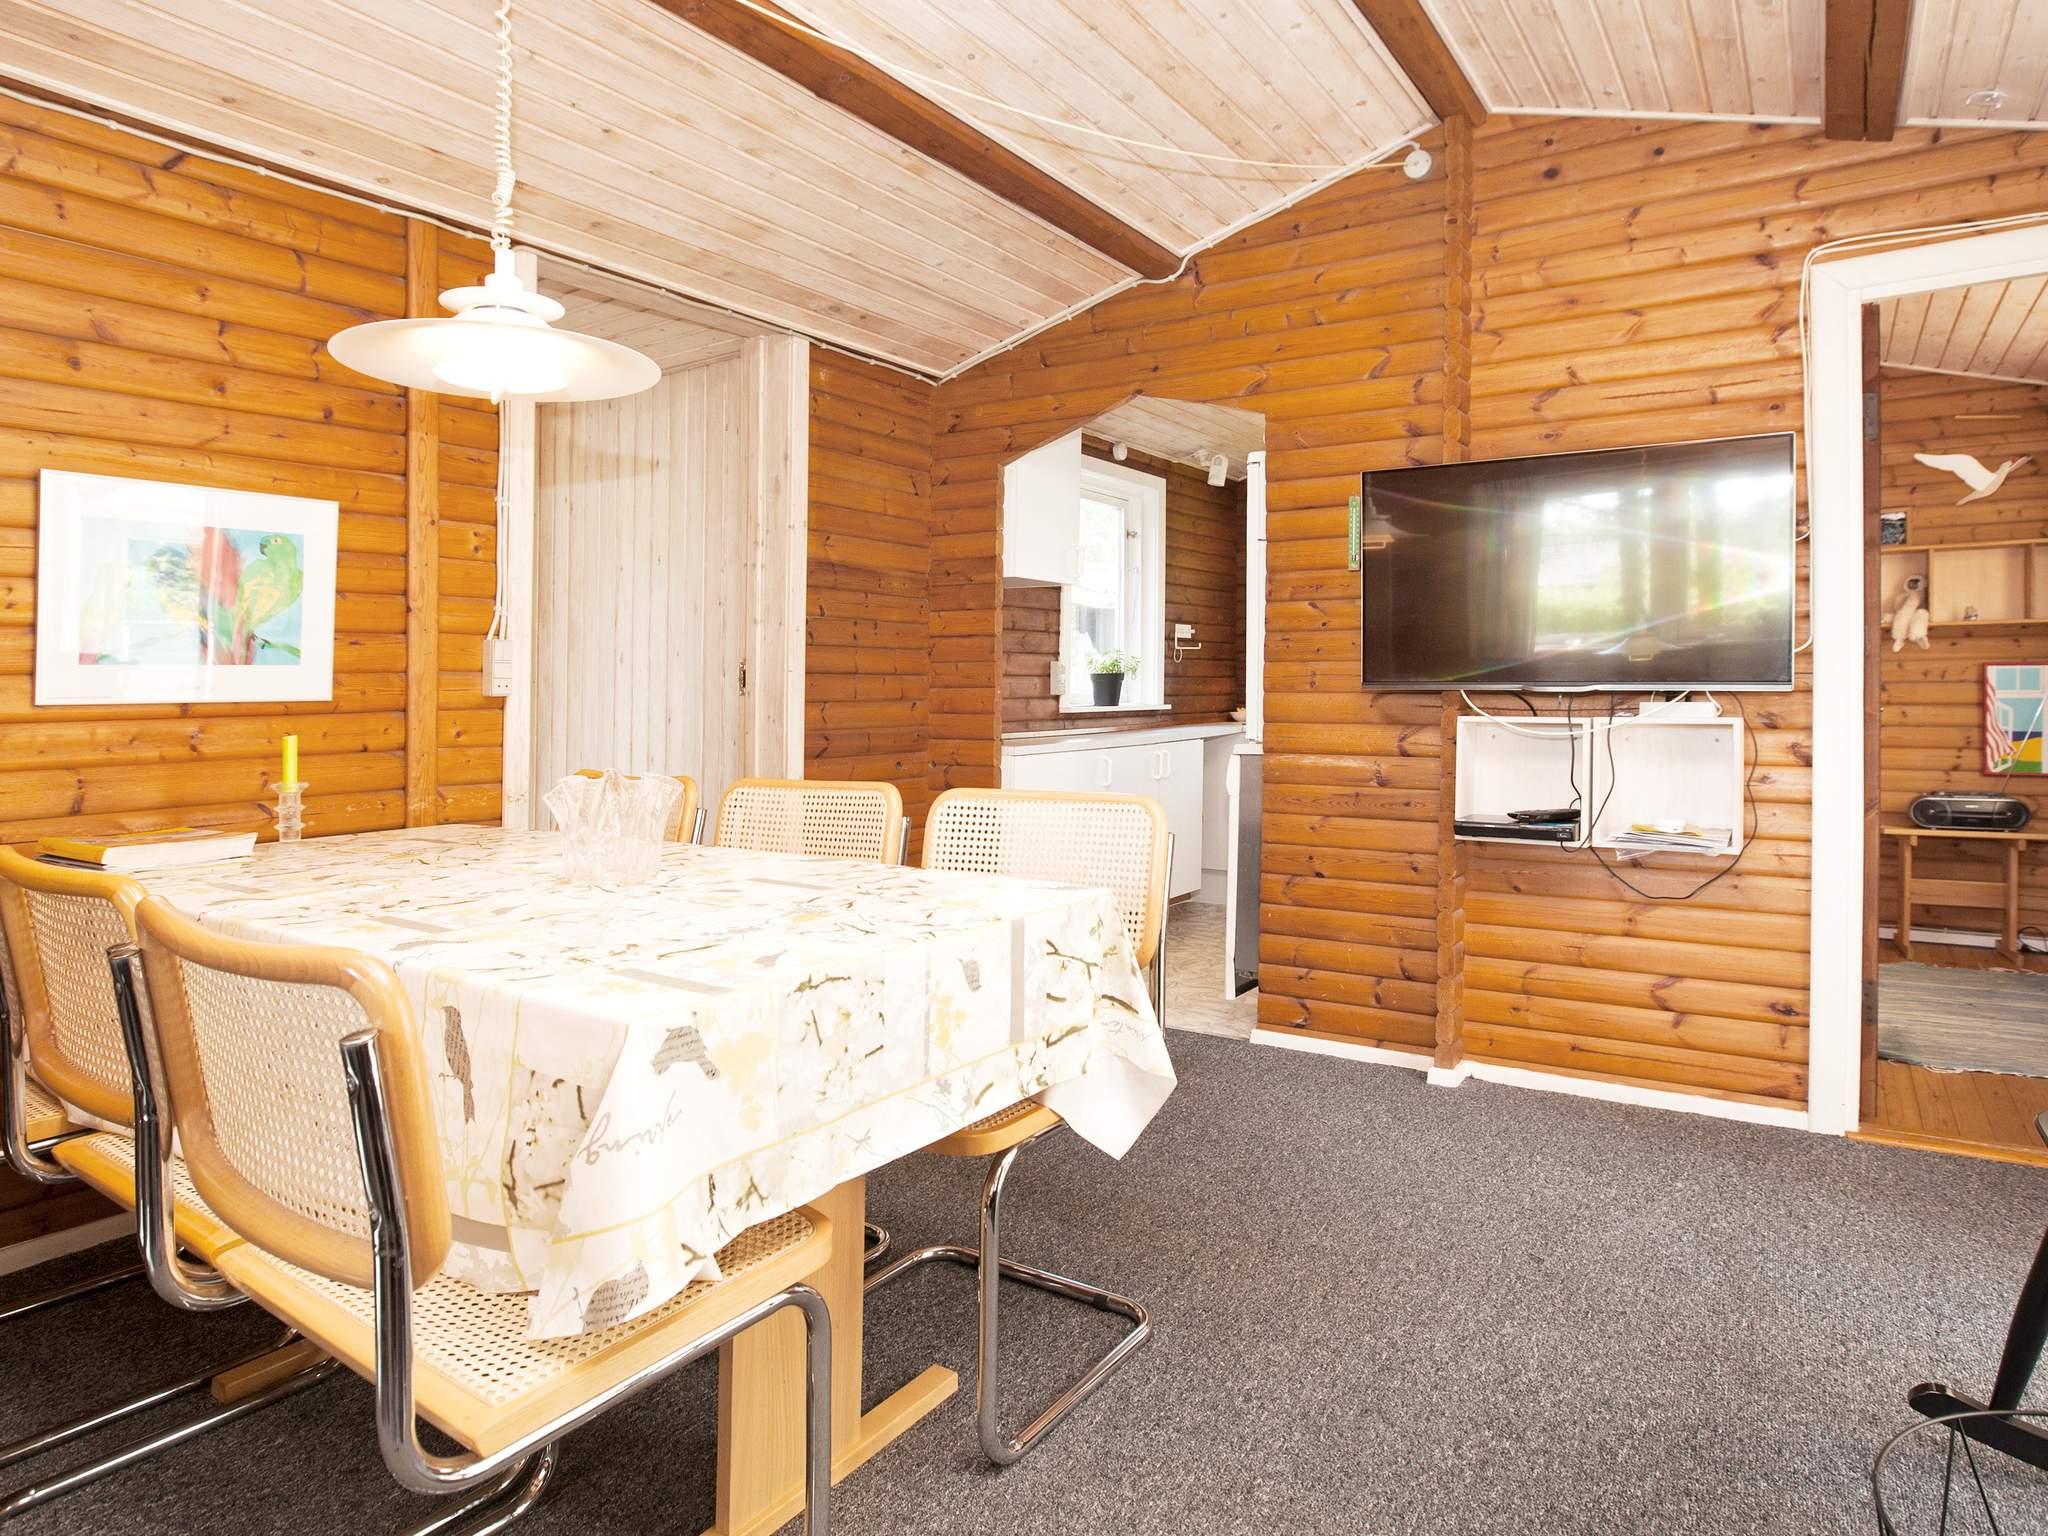 Maison de vacances Kramnitze (87262), Kramnitse, , Lolland, Danemark, image 4